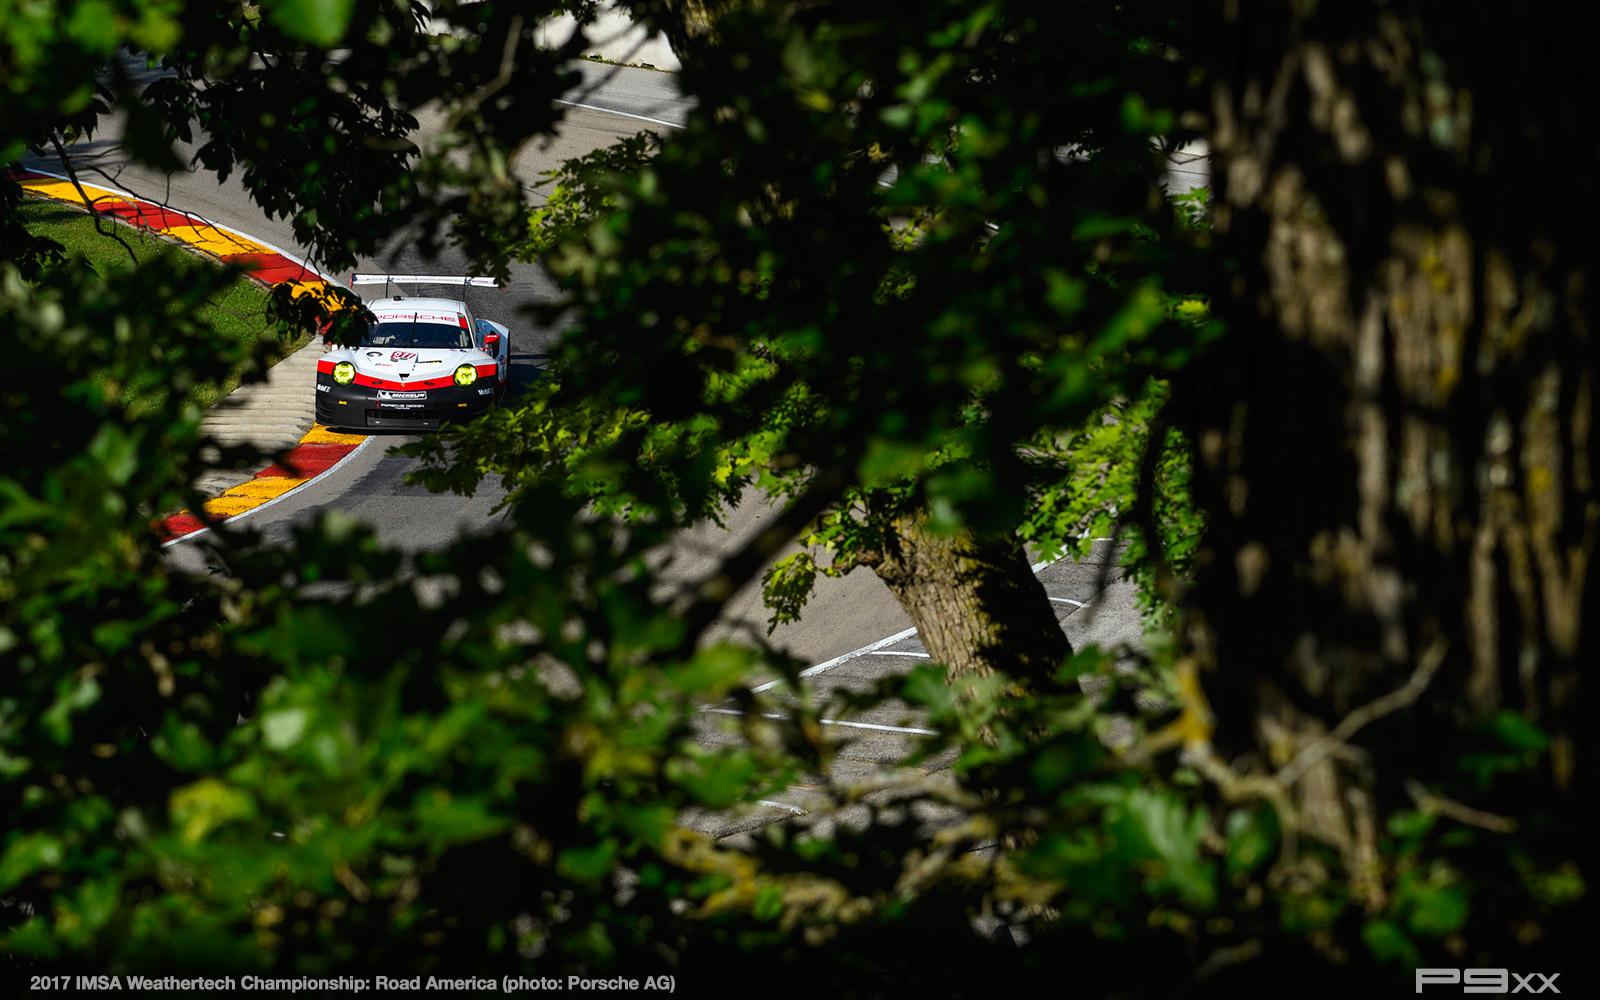 2017-IMSA-Weathertech-Road-America-Porsche-318